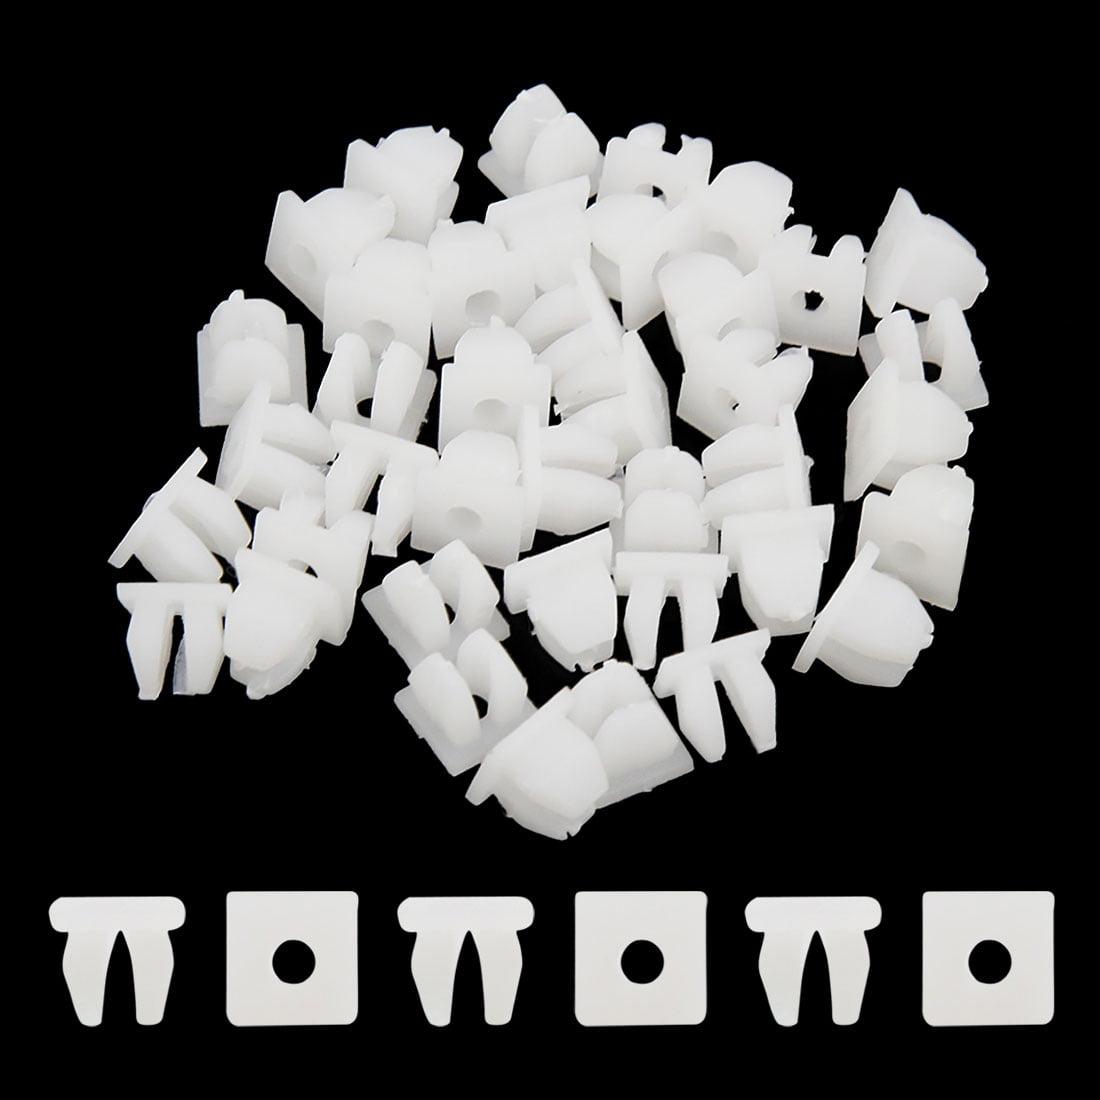 40 Pcs White Auto Door Plastic Rivet Fastener Retainer Clip for 9mmx 8mm Hole - image 1 of 2